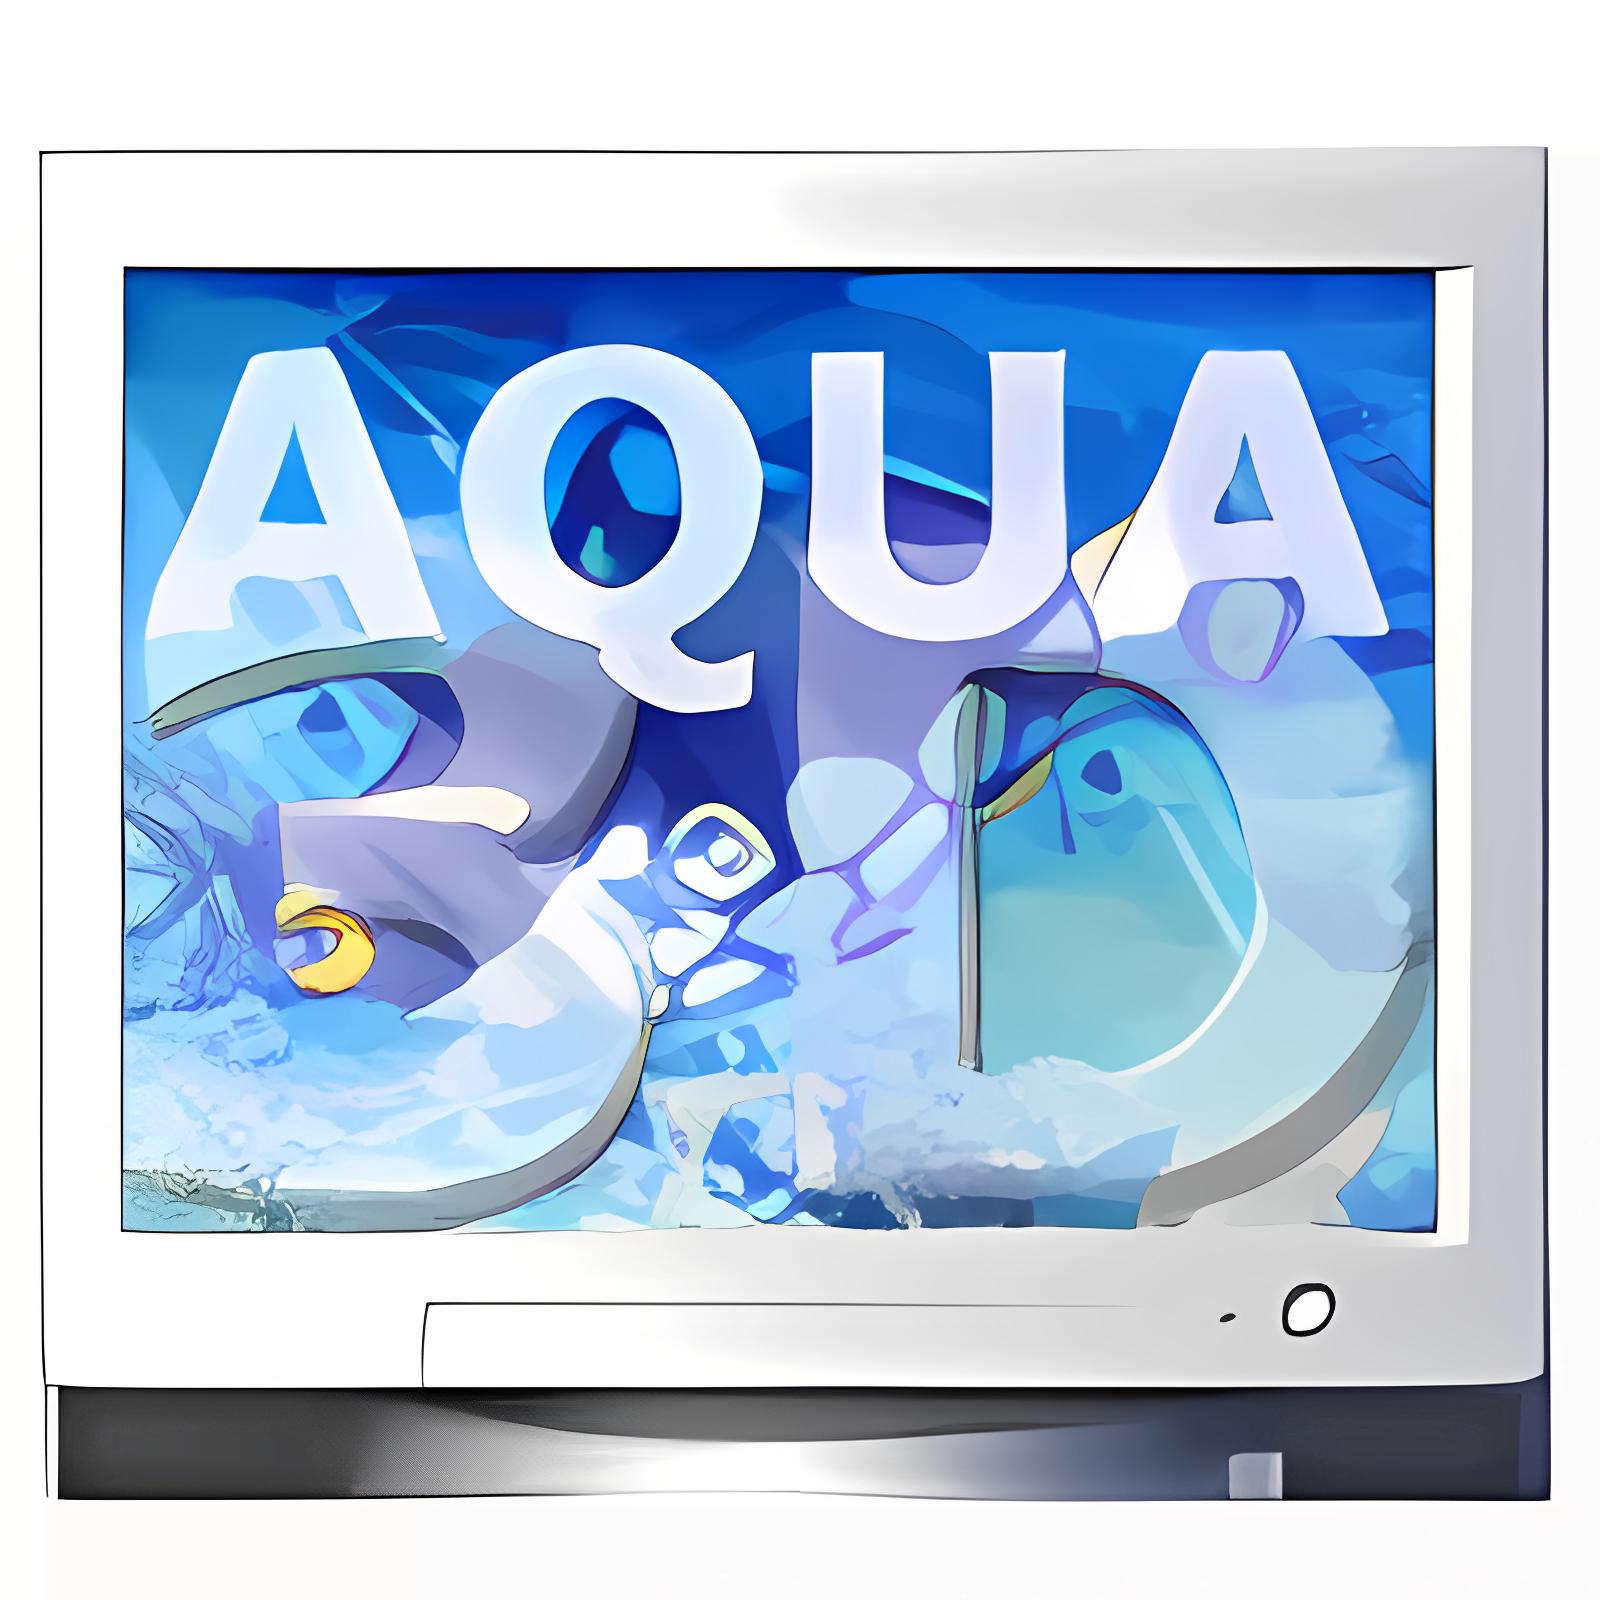 Salvapantallas: Aqua 3D para Mac OS X